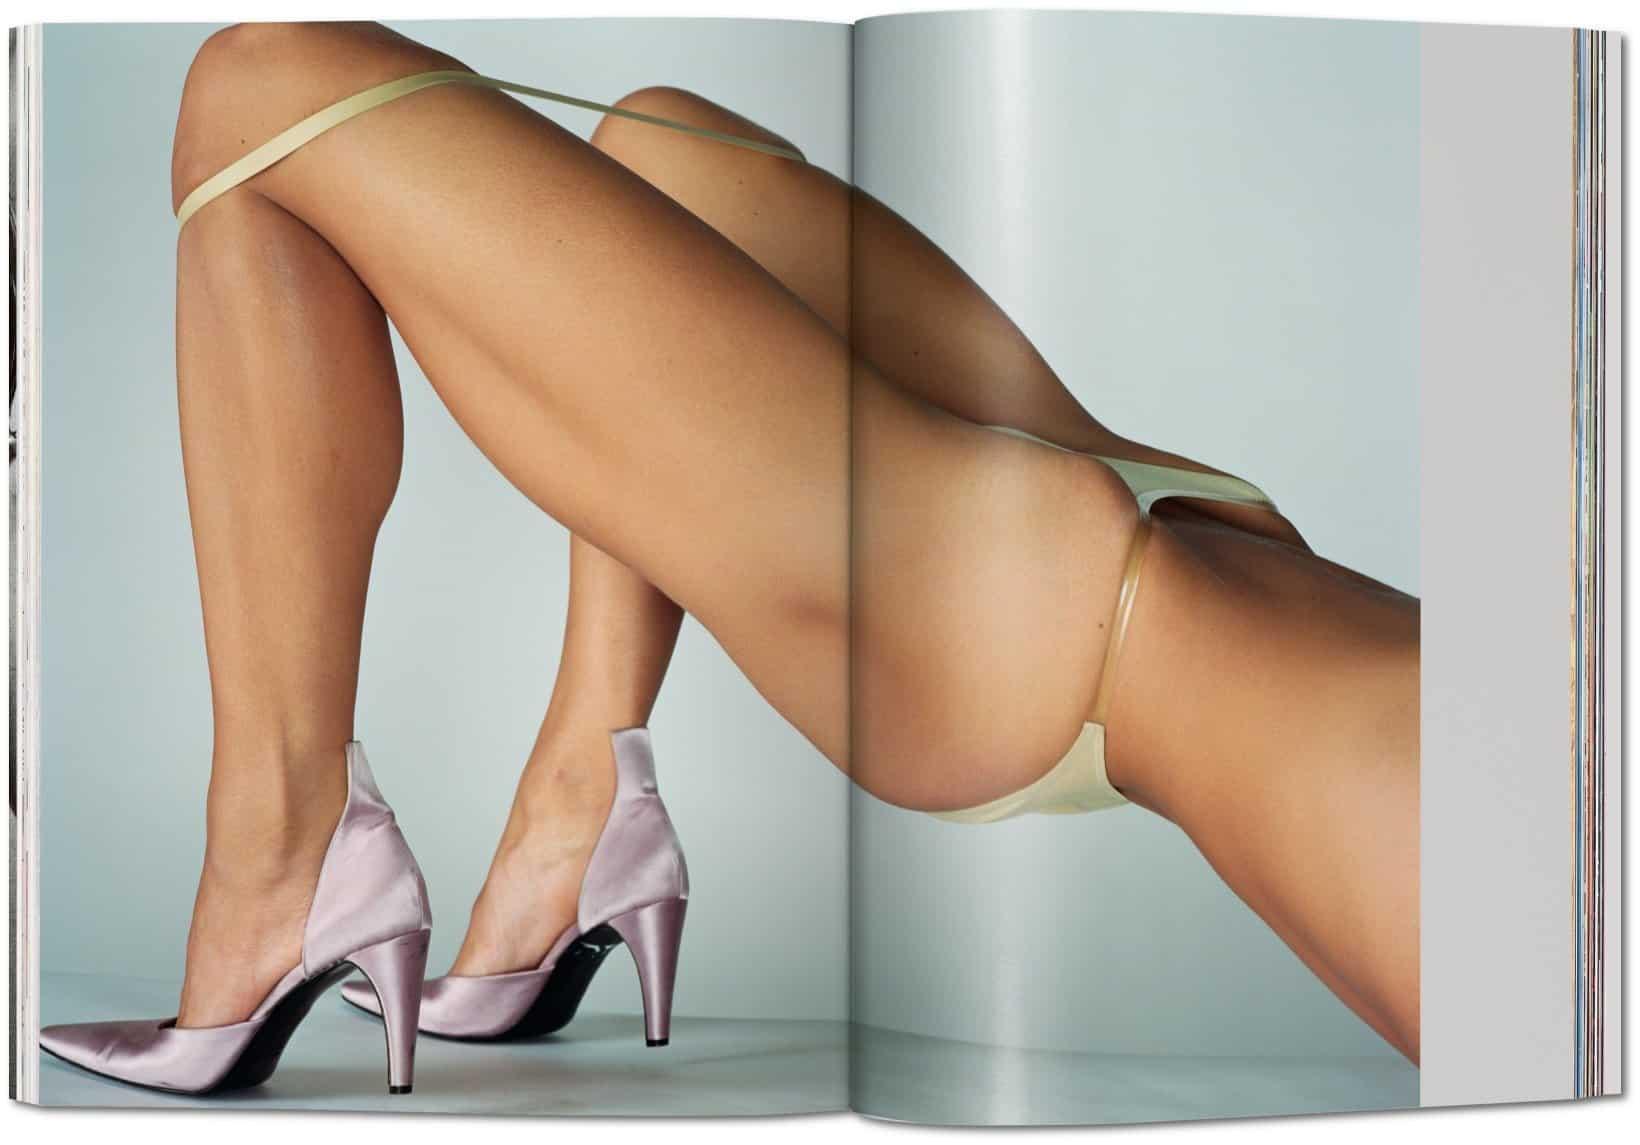 mario testino libro undressed xxl foto moda desnudo arte taschen